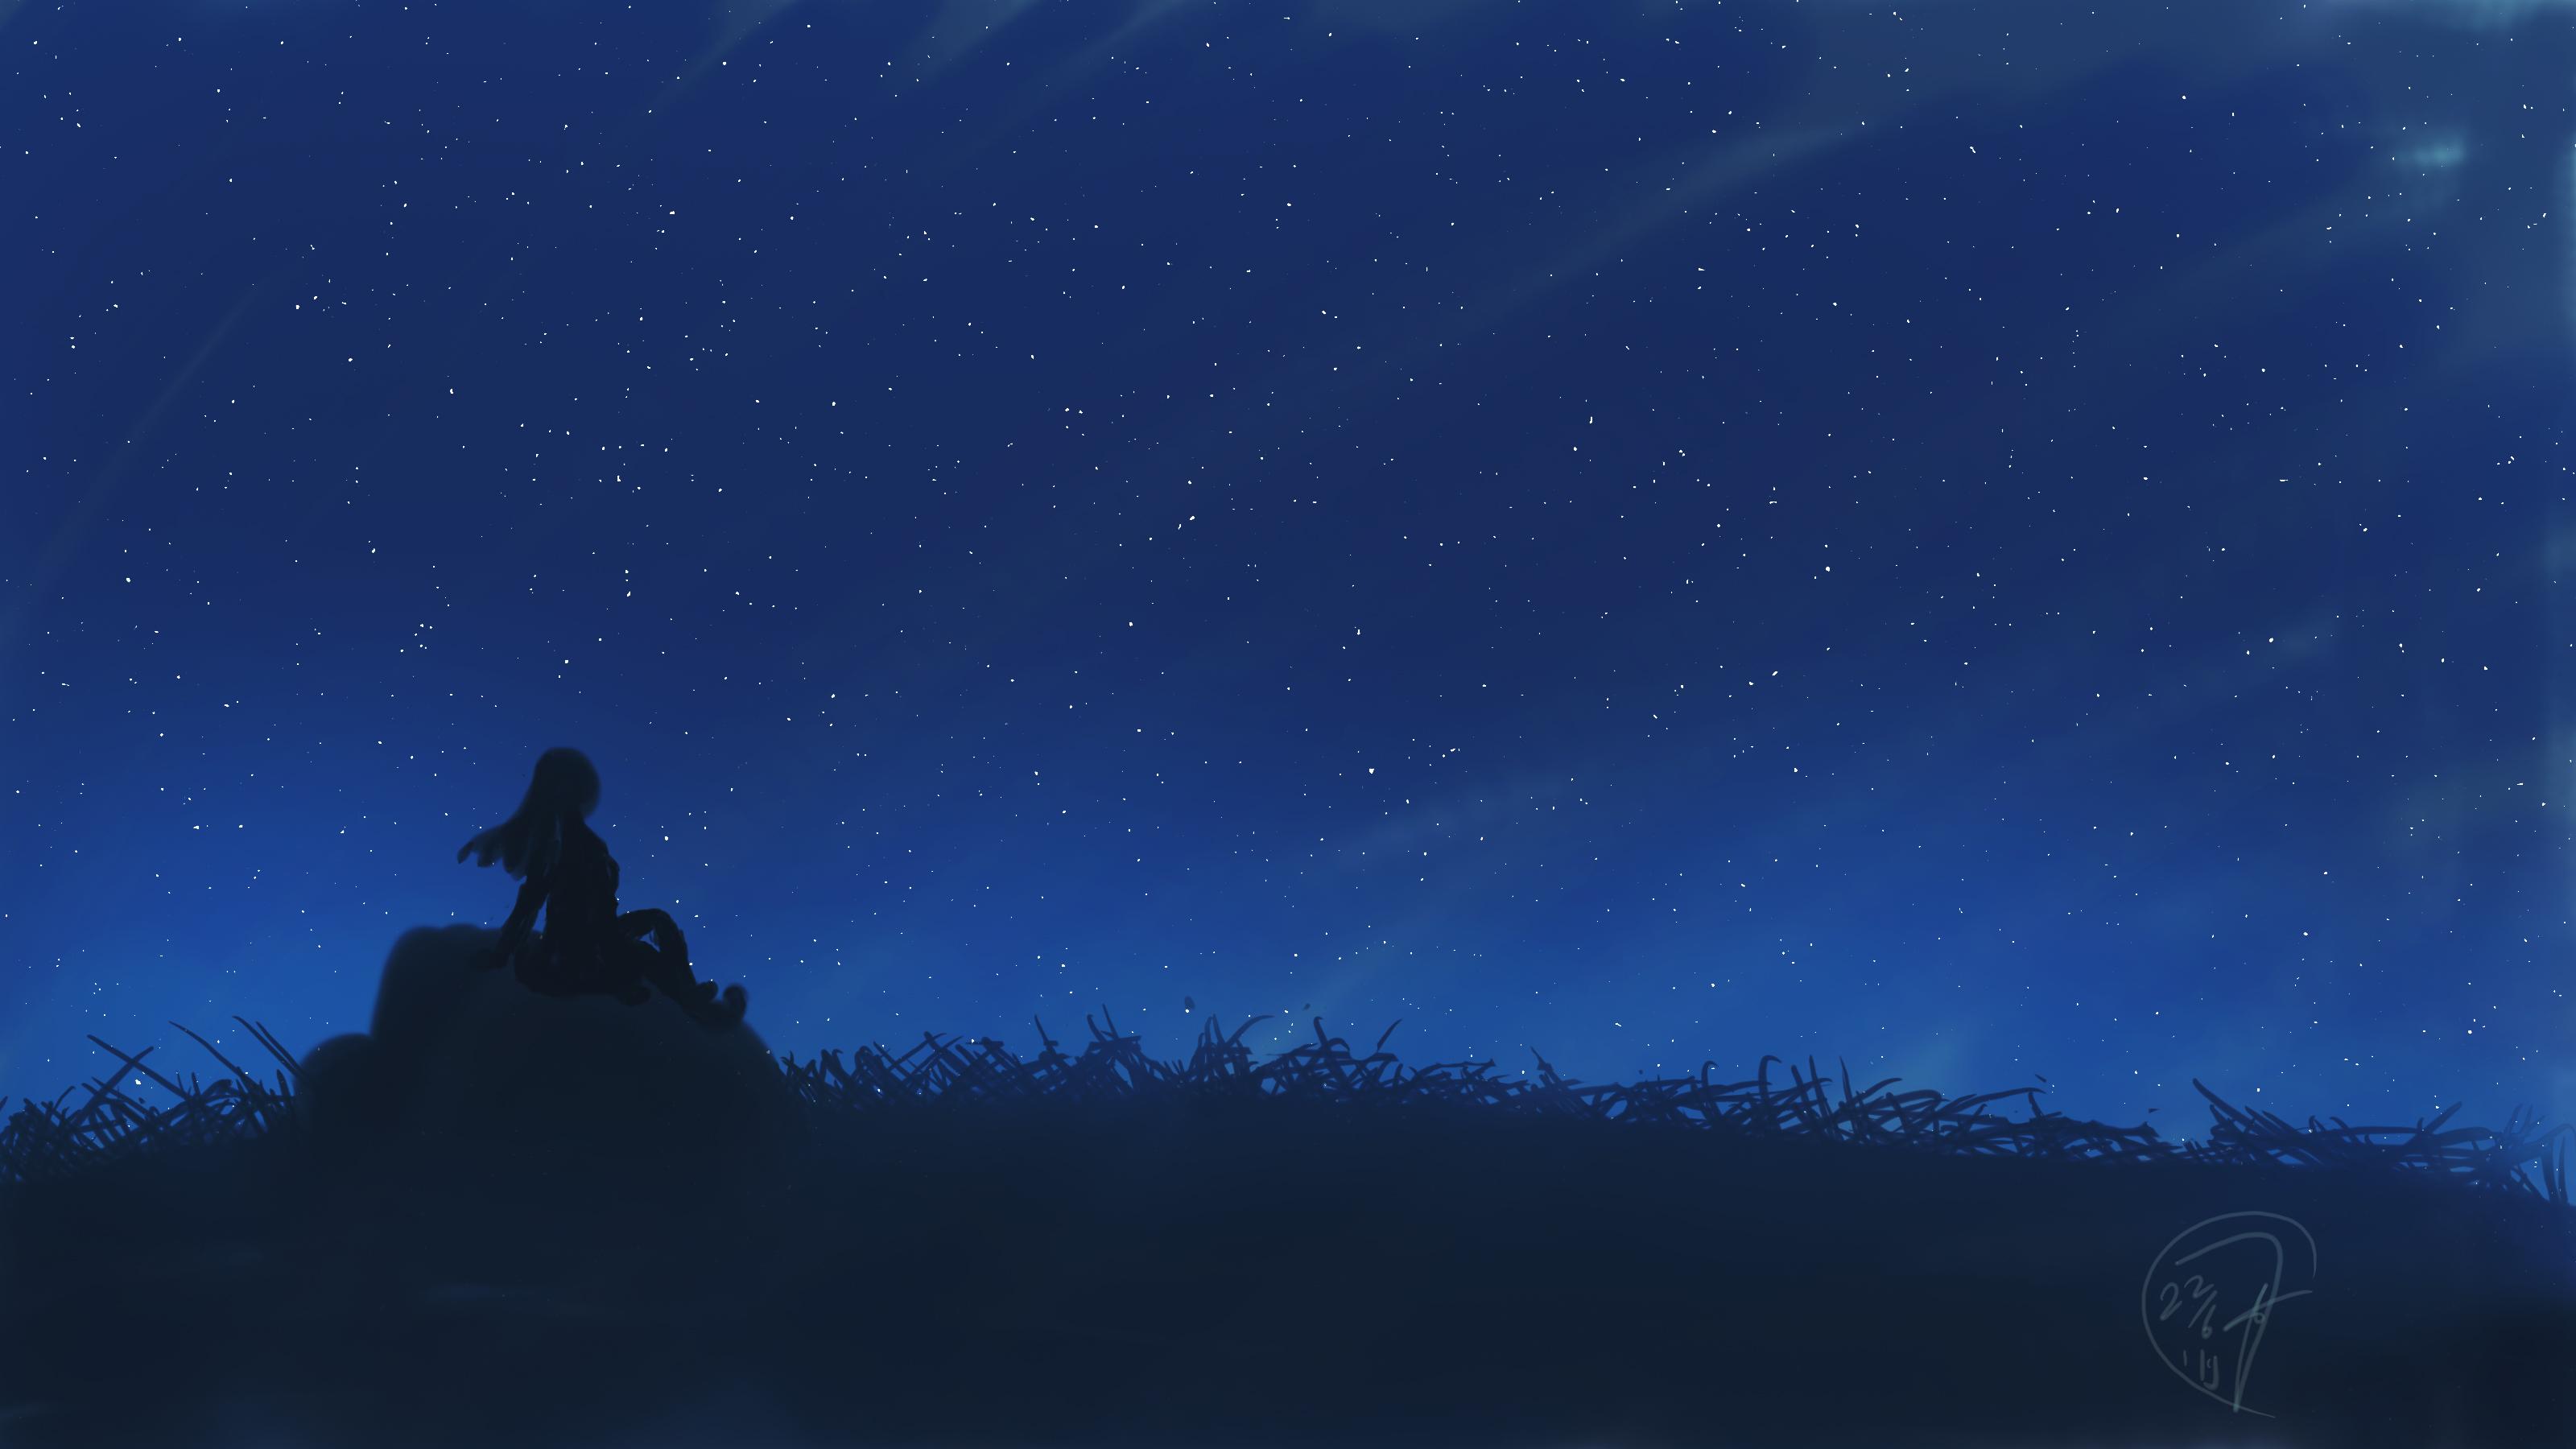 General 3200x1800 digital digital art artwork night sky skyscape nature silhouette women women outdoors blue stars starry night grass landscape rocks